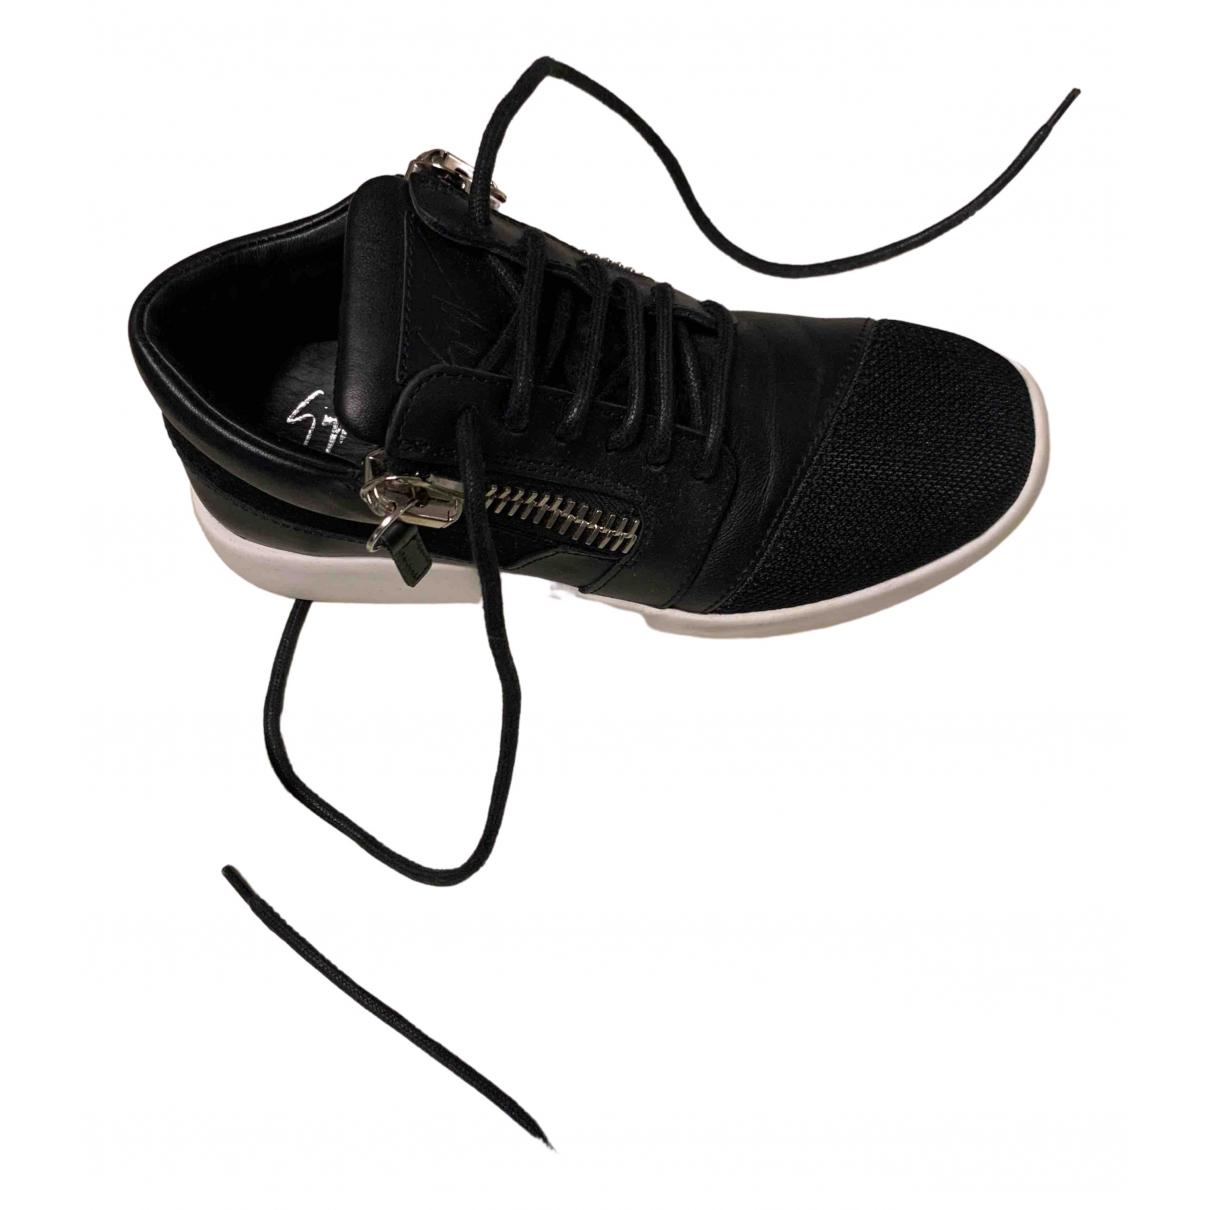 Giuseppe Zanotti - Baskets Nicki pour femme en cuir - noir